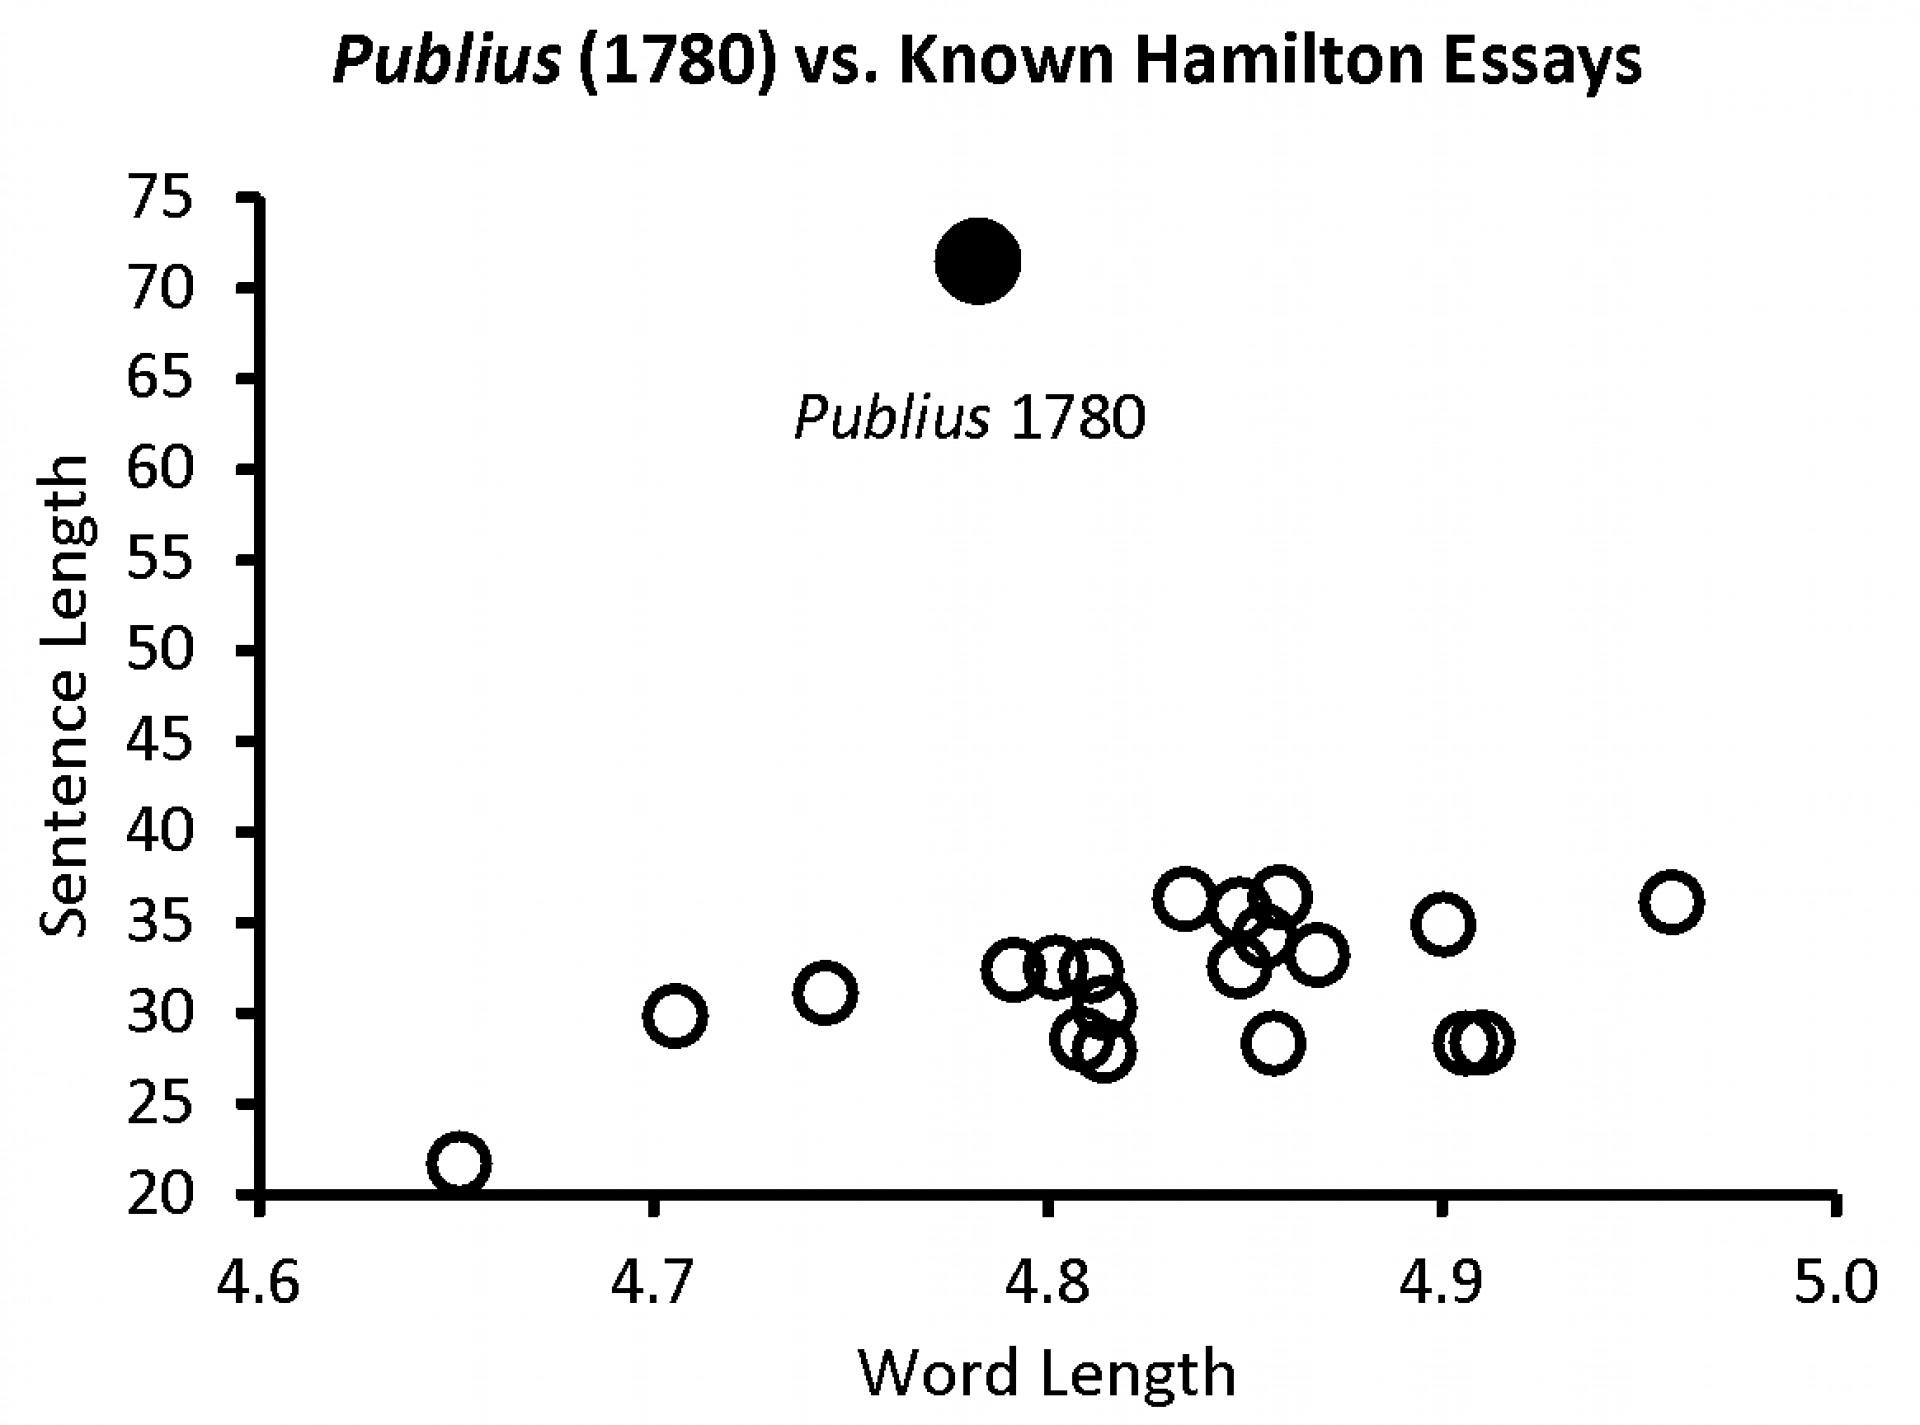 007 Alexander Hamilton Essays Publius1780 Essay Frightening Federalist Papers Summary 51 1920